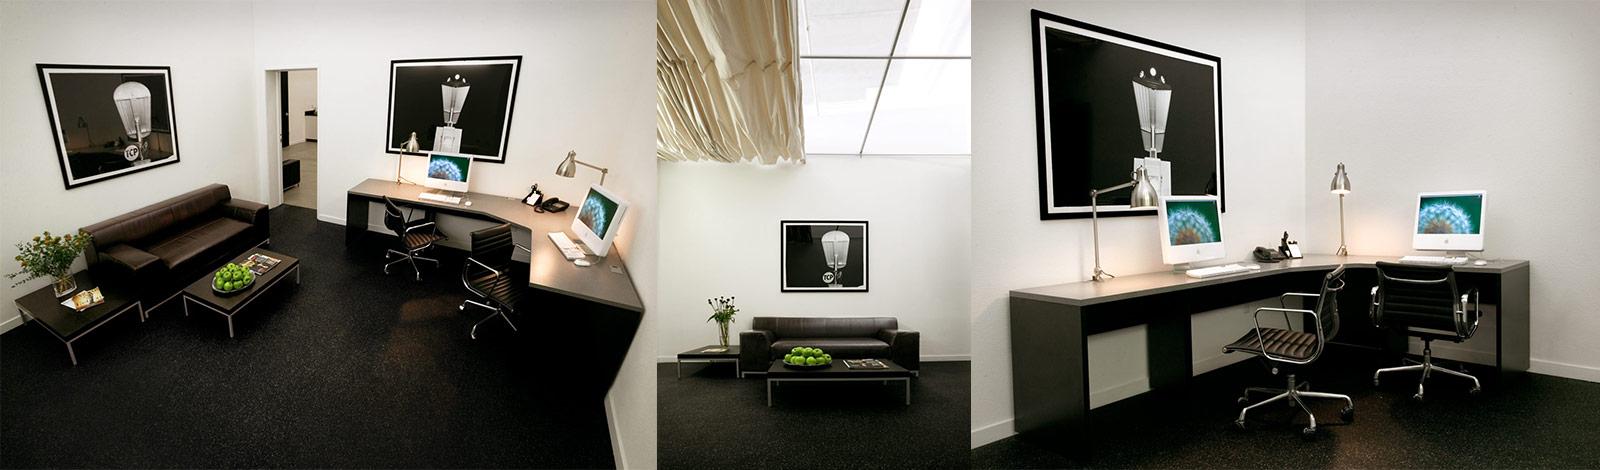 green-suite-wide-composite